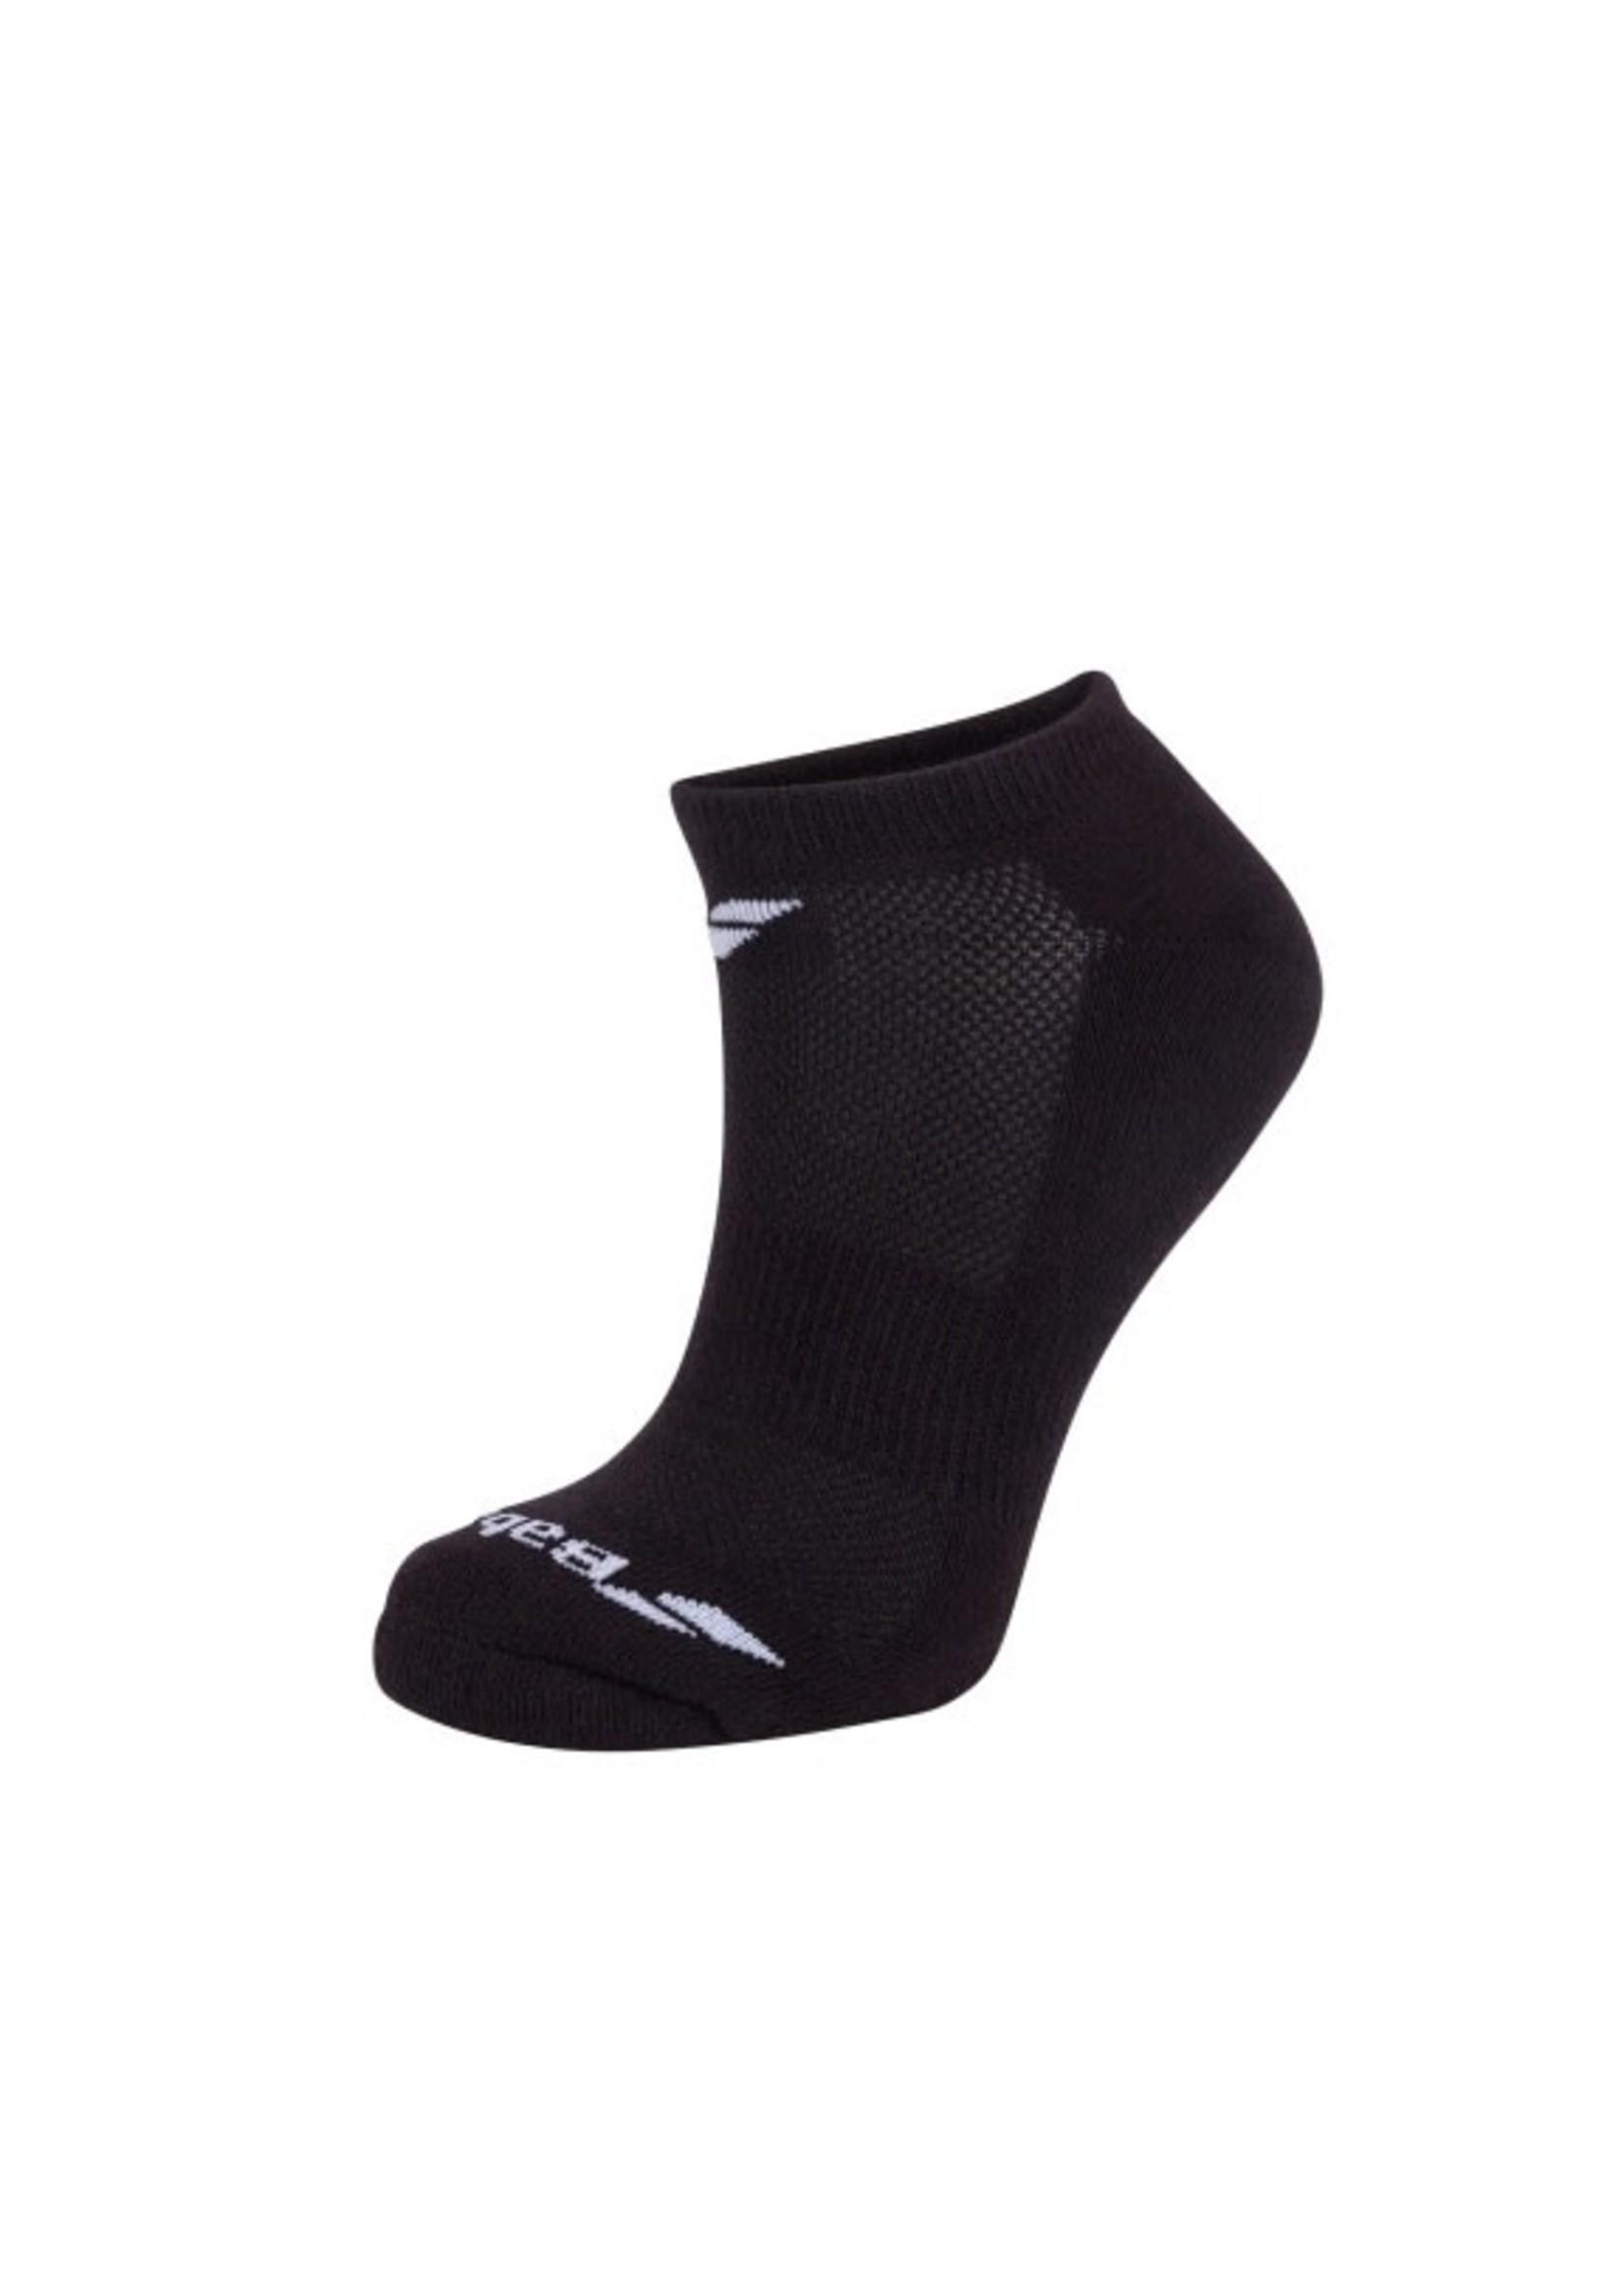 Babolat Babolat Invisible Socks, 3 Pack (2020)